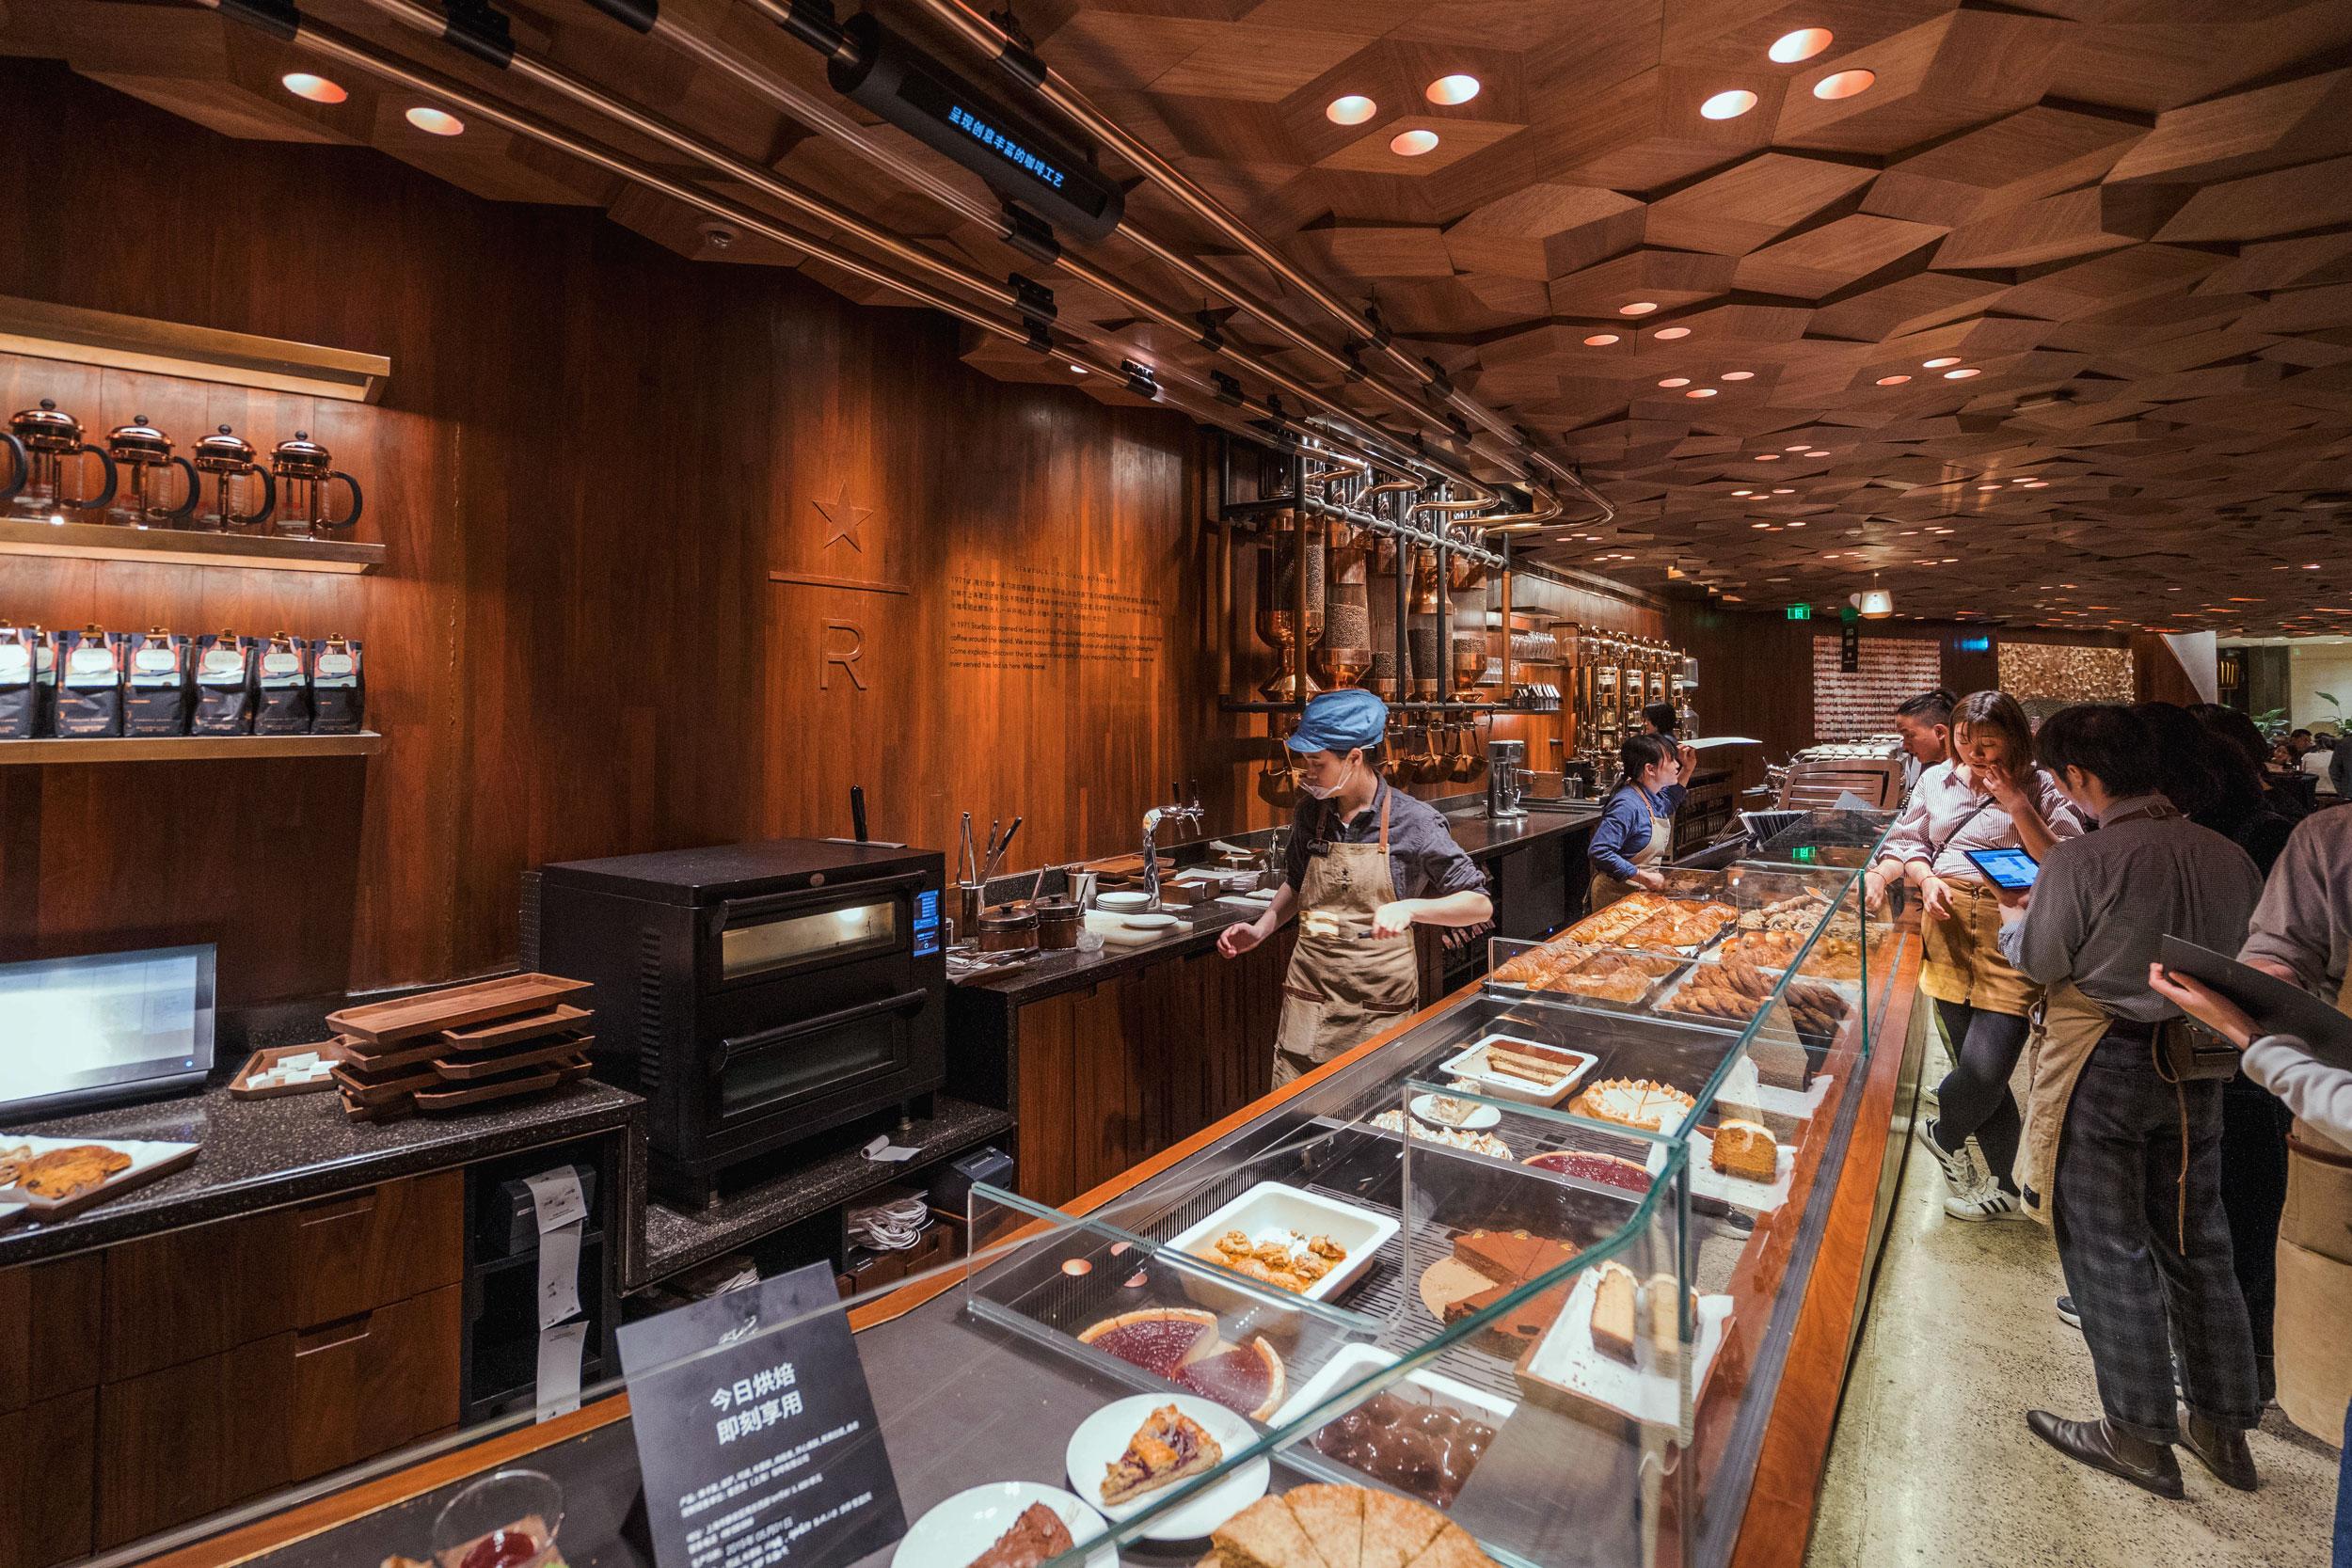 Bakery counter on the second floor of Starbucks Reserve Shanghai Roastery